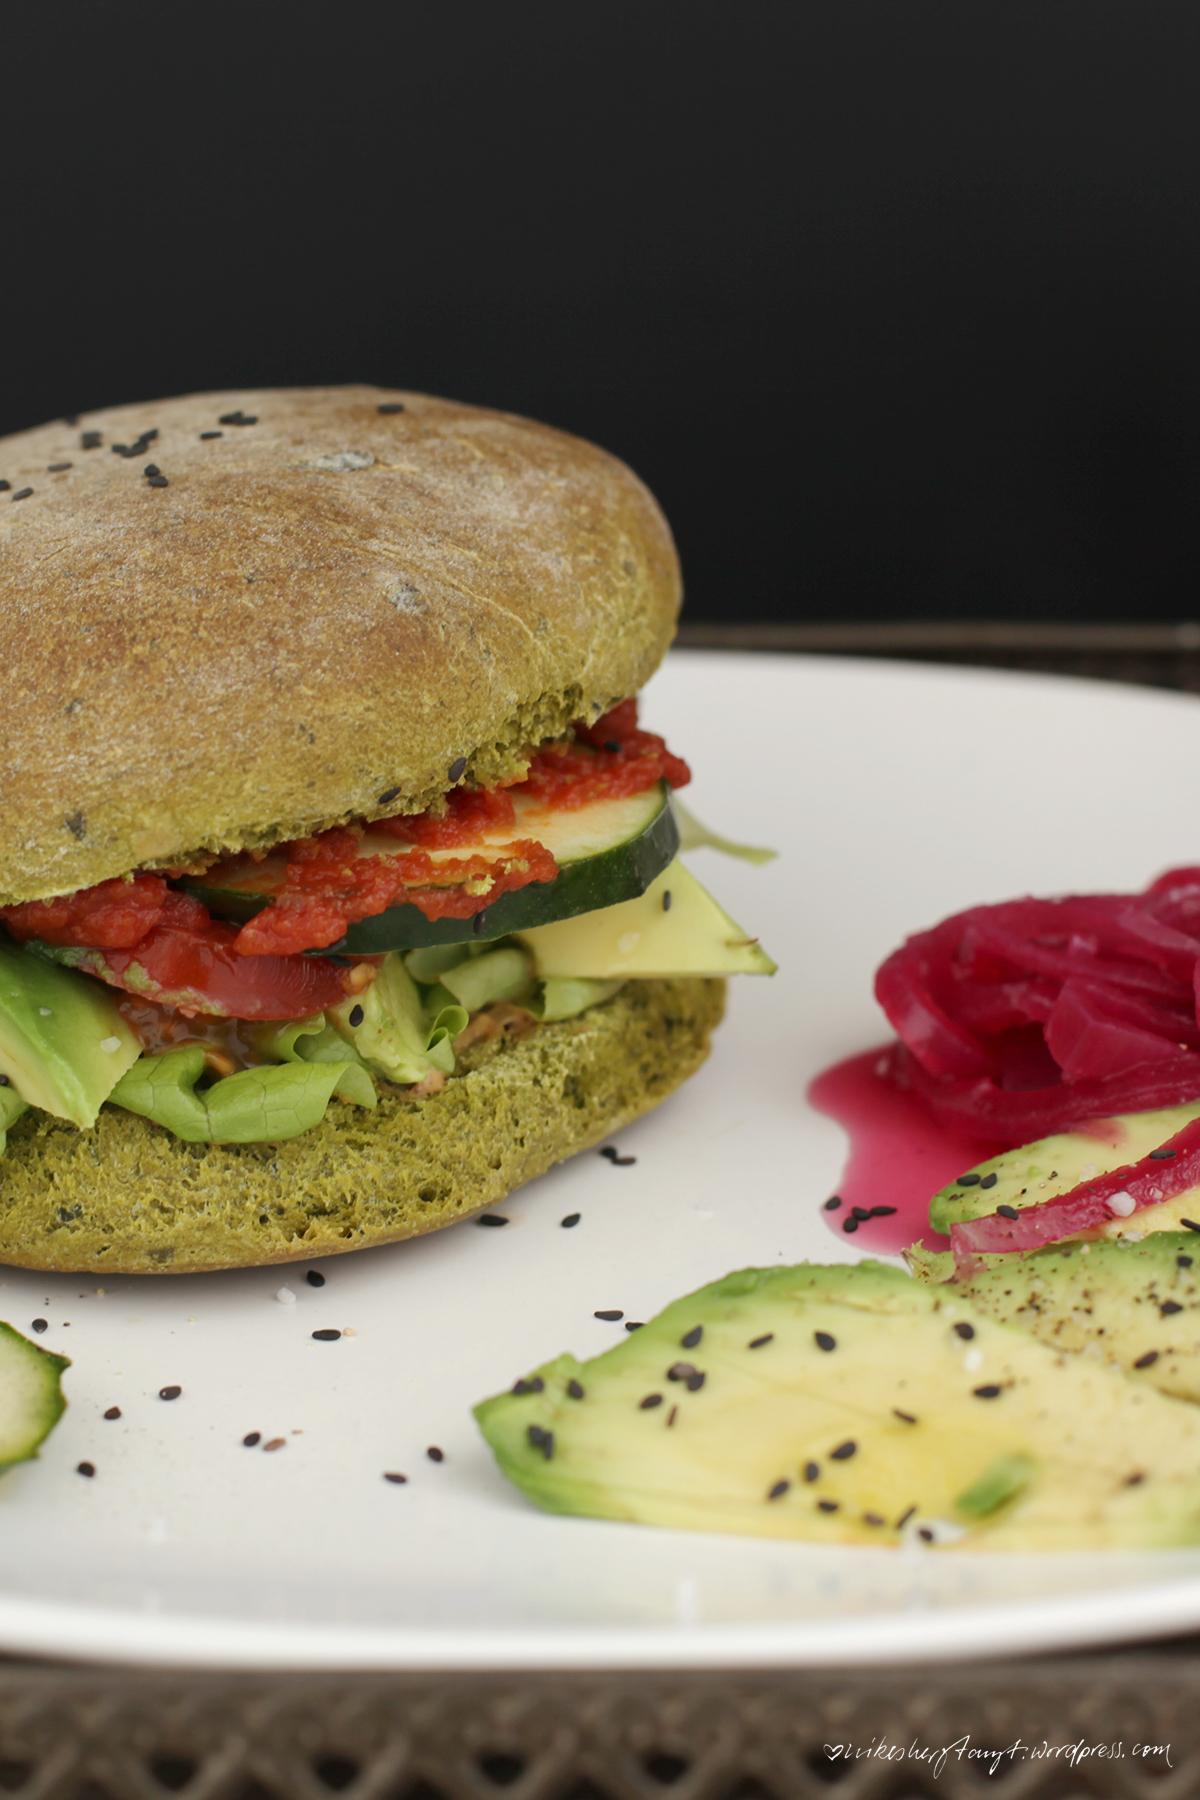 avocado, burger, grünes brot, oh sophia, sophias vegane welt, kochbuchliebe, pinke zwiebeln, nikes herz tanzt